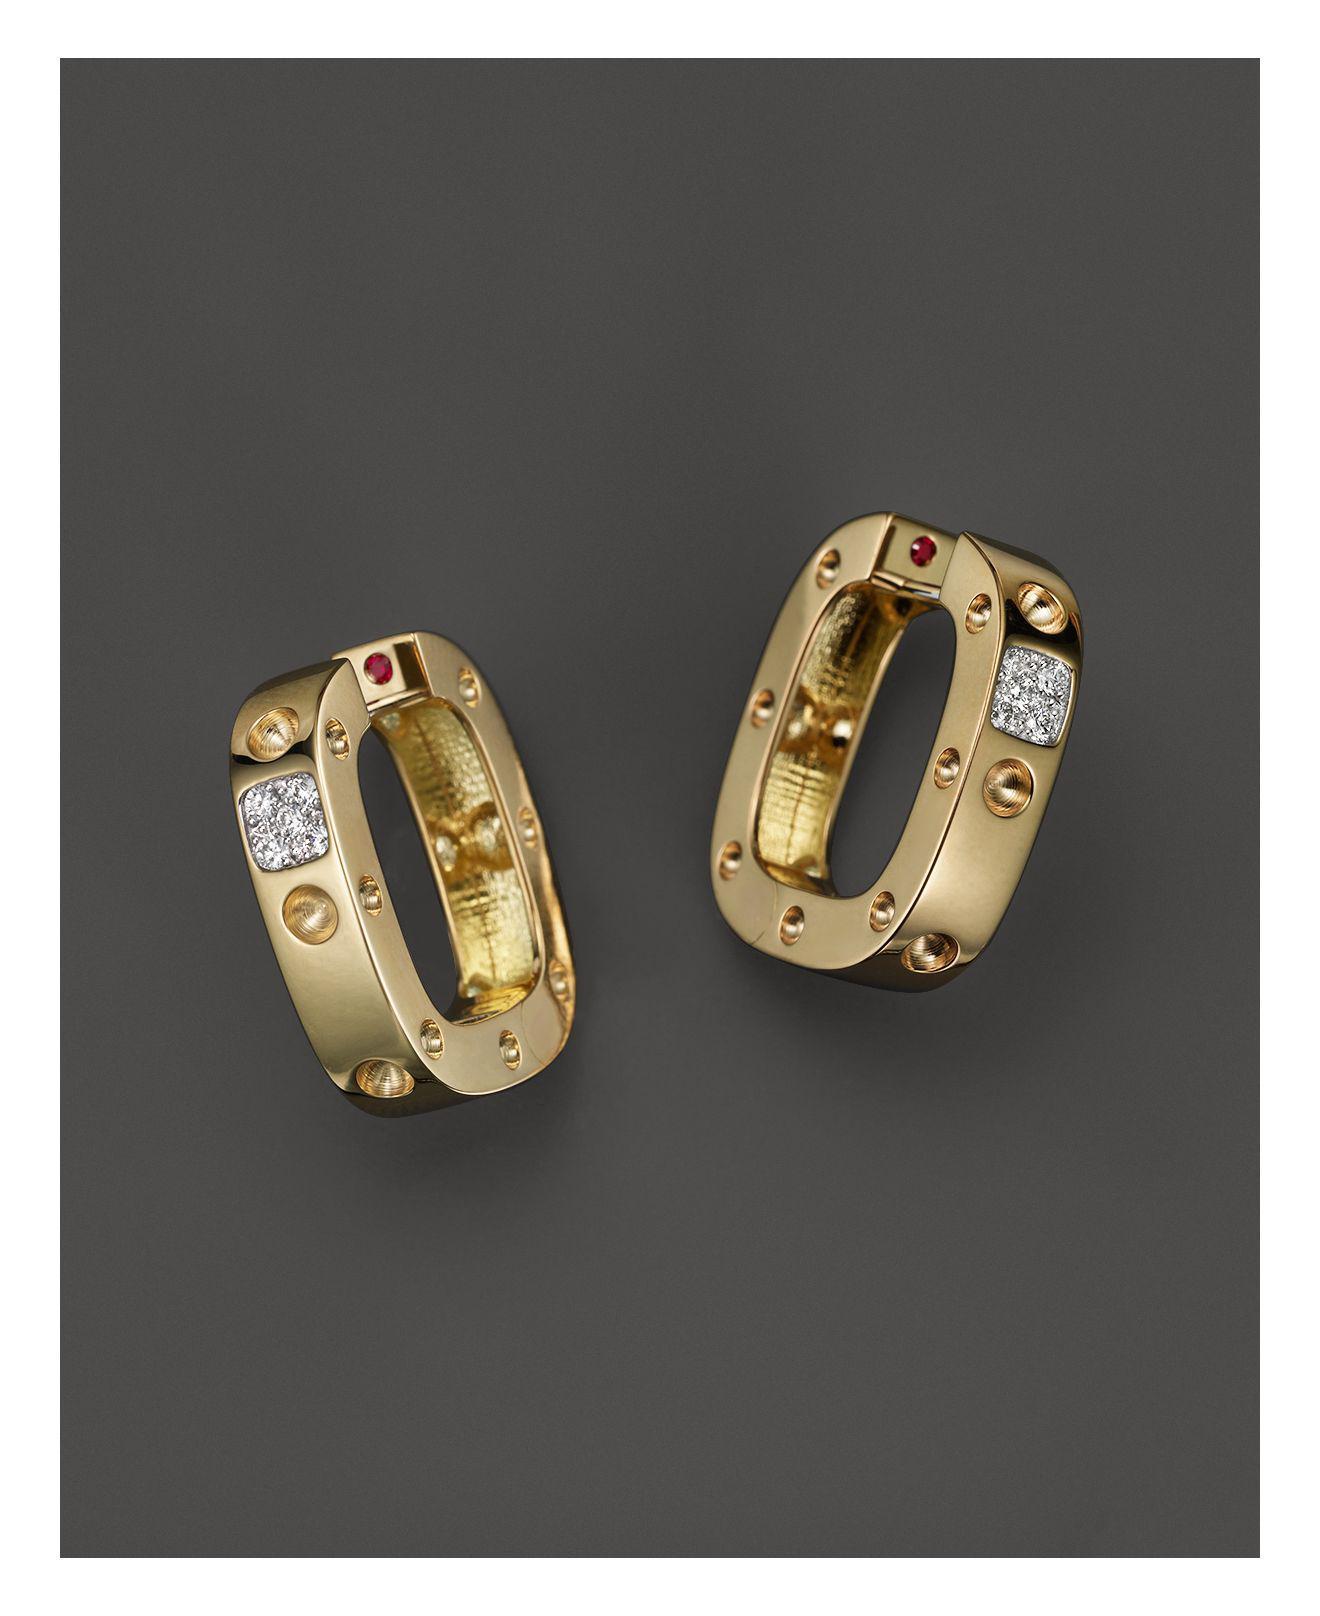 Roberto Coin Pois Moi 18k Square Diamond Stud Earrings 36e3Nx